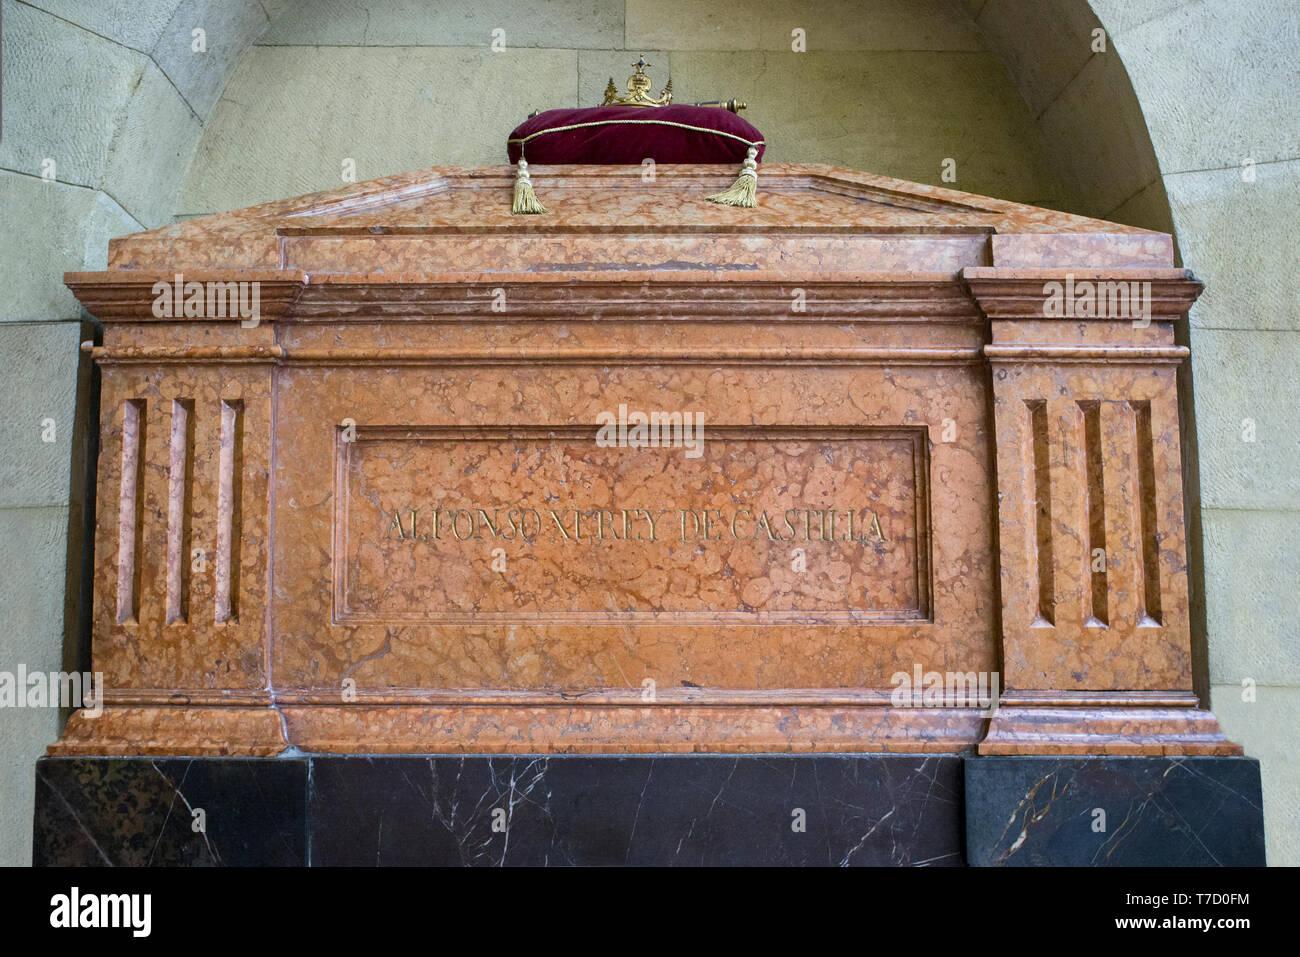 Córdoba Spain -  Dec 7th, 2019: Tomb of Alfonso XI of Castile at Royal Collegiate Church of Saint Hippolytus - Stock Image